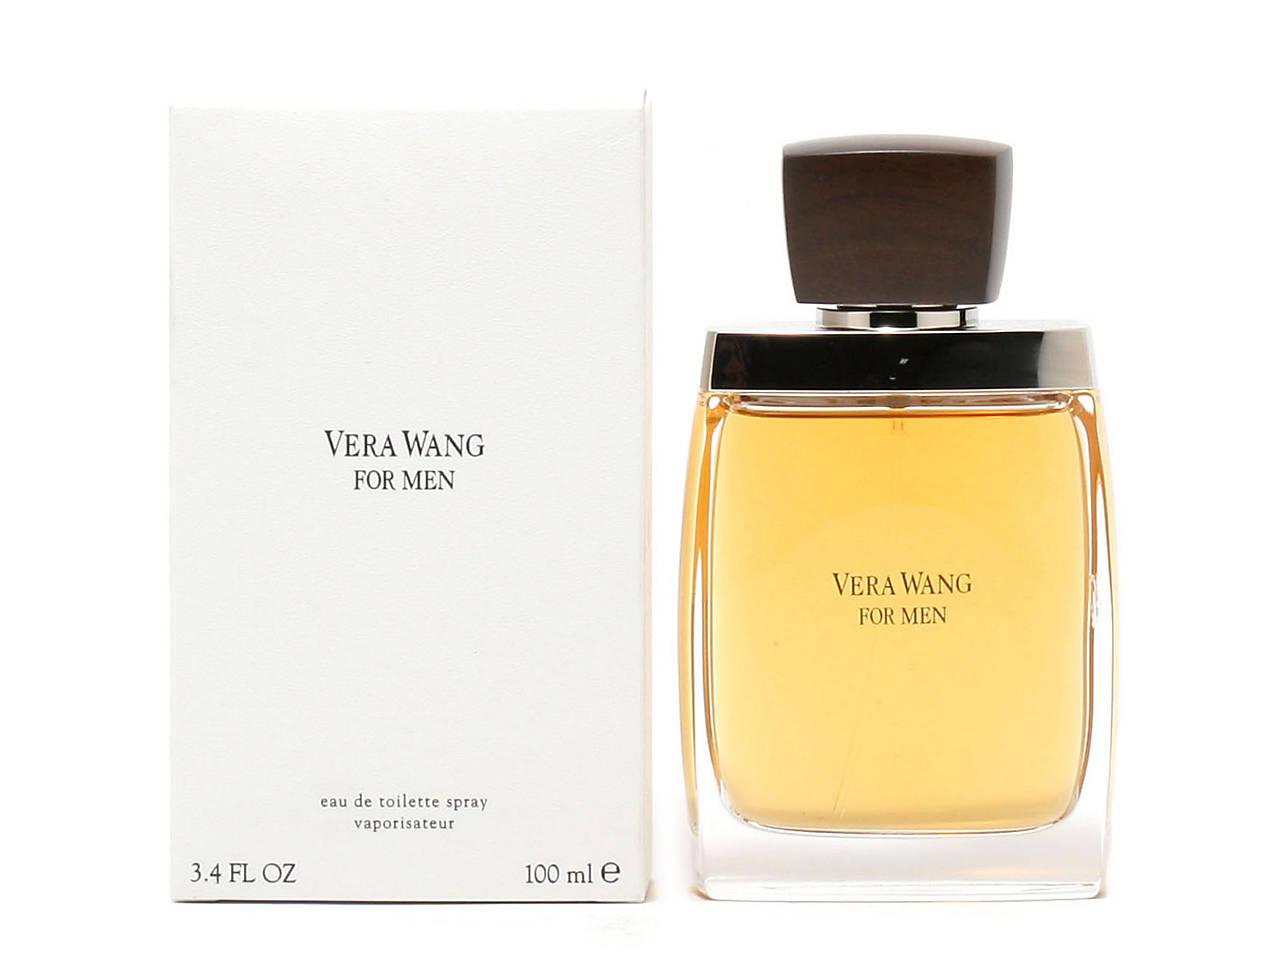 Vera Wang Fragrance For Men Eau De Toilette Spray Mens Women Parfum 100 Ml